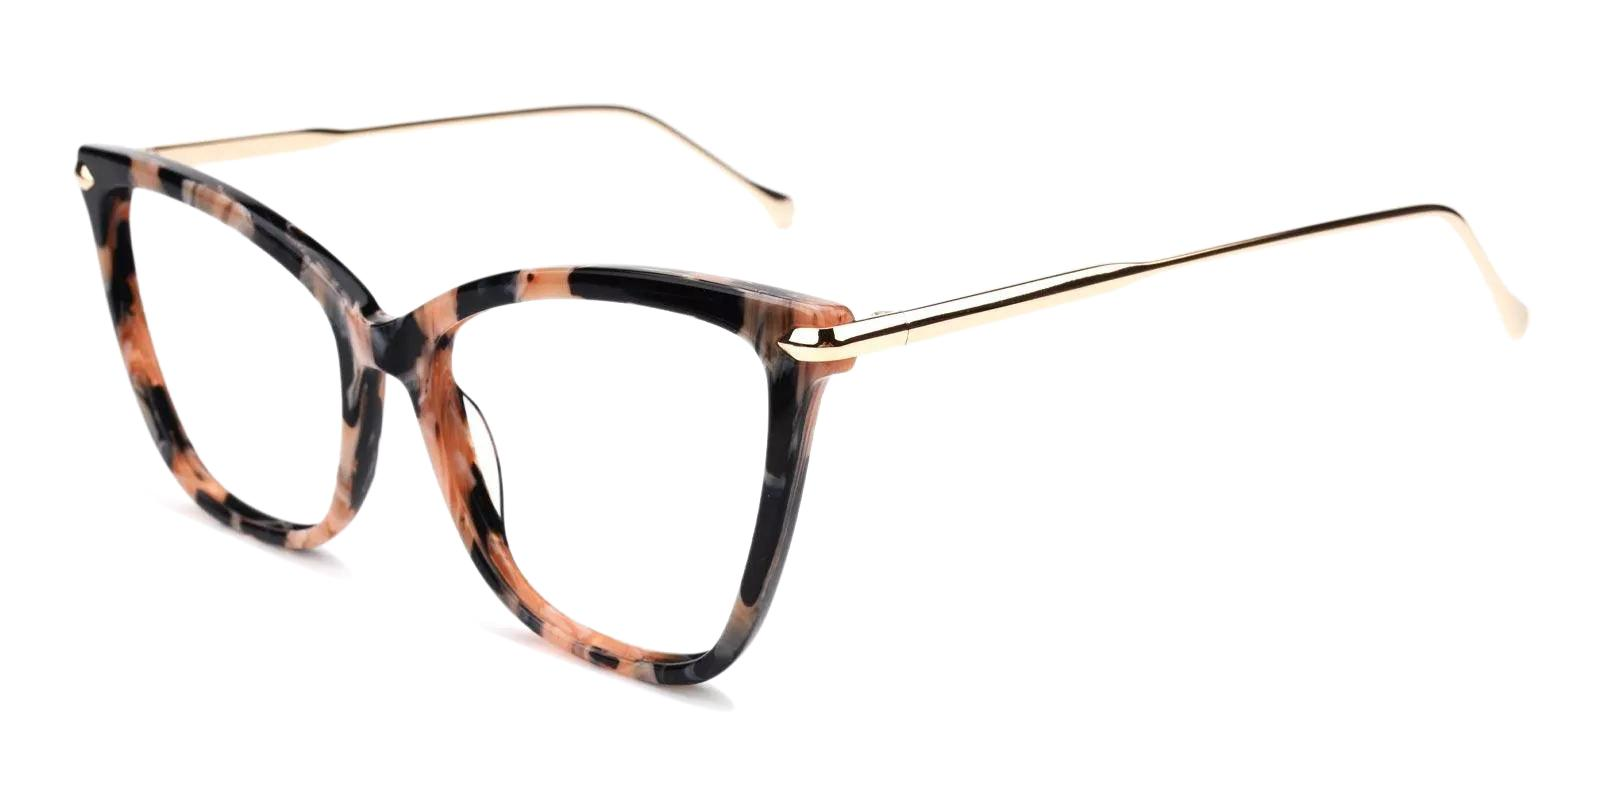 Gosse Pink Acetate , Metal Eyeglasses , Fashion , UniversalBridgeFit Frames from ABBE Glasses